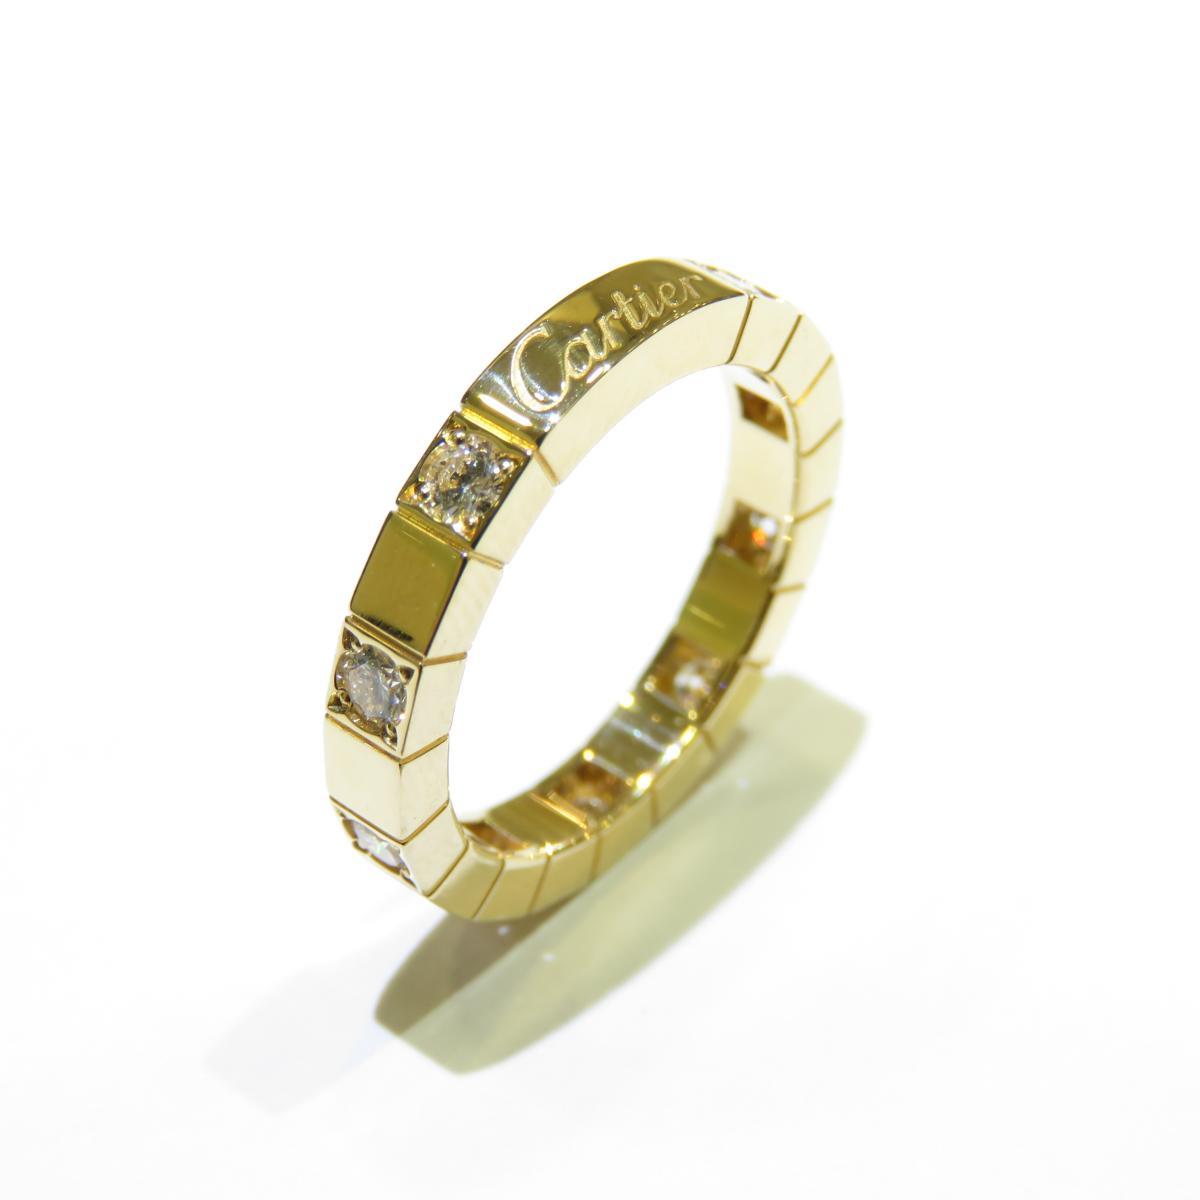 Cartier(カルティエ)/ラニエール ハーフダイヤ リング 指輪/リング//K18YG(750)イエローゴールド×ダイヤモンド/【ランクA】/#49/9号【中古】